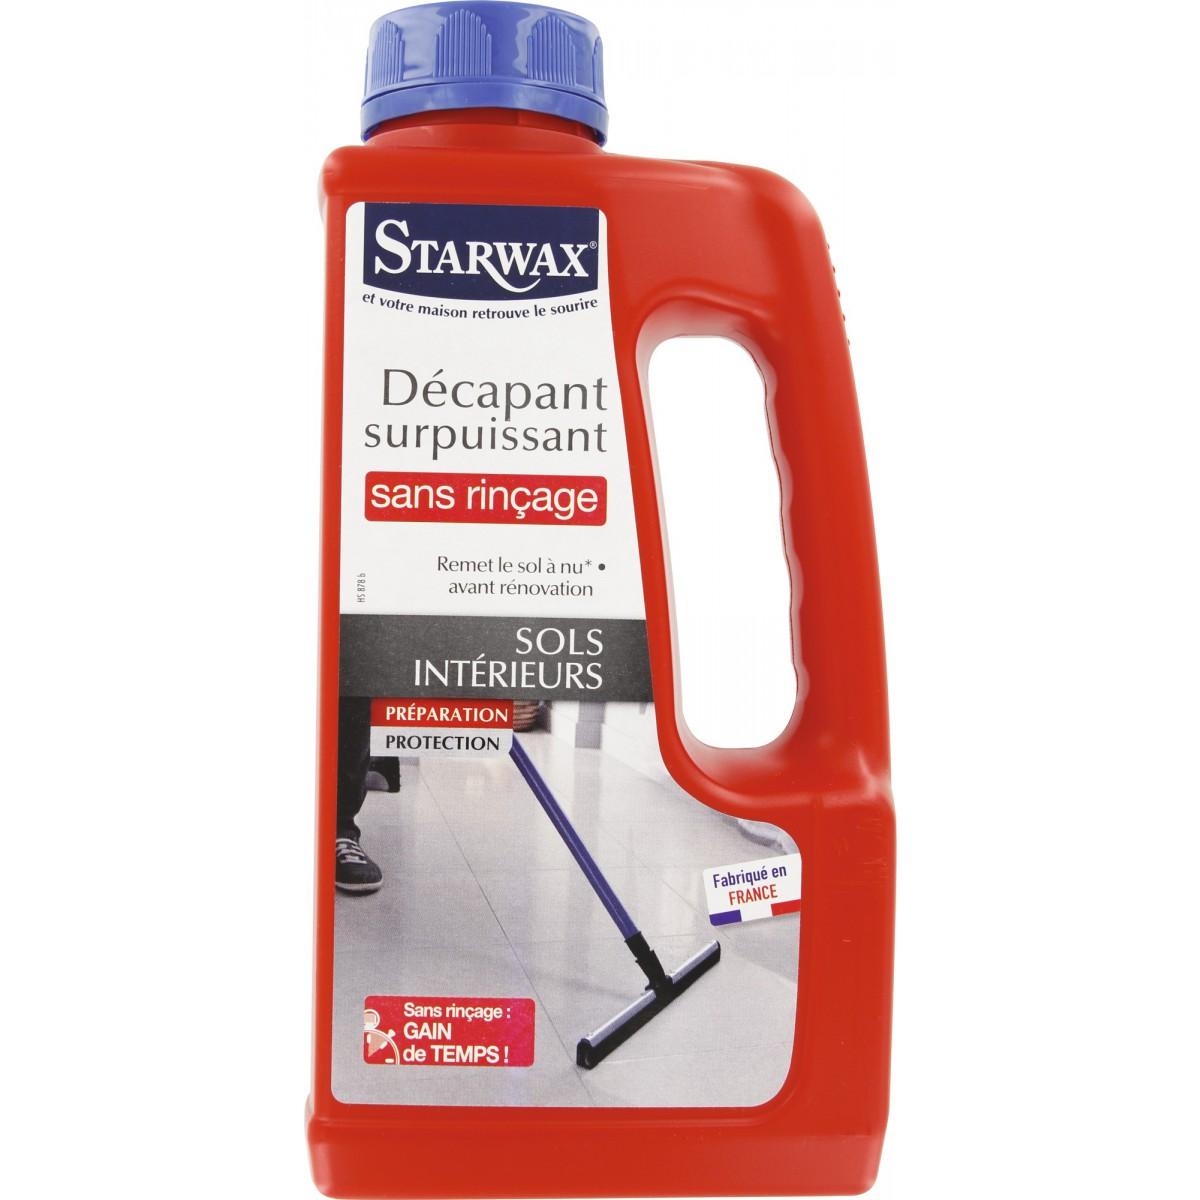 Décapant avant rénovation Starwax - Sans rinçage - Flacon 1 l